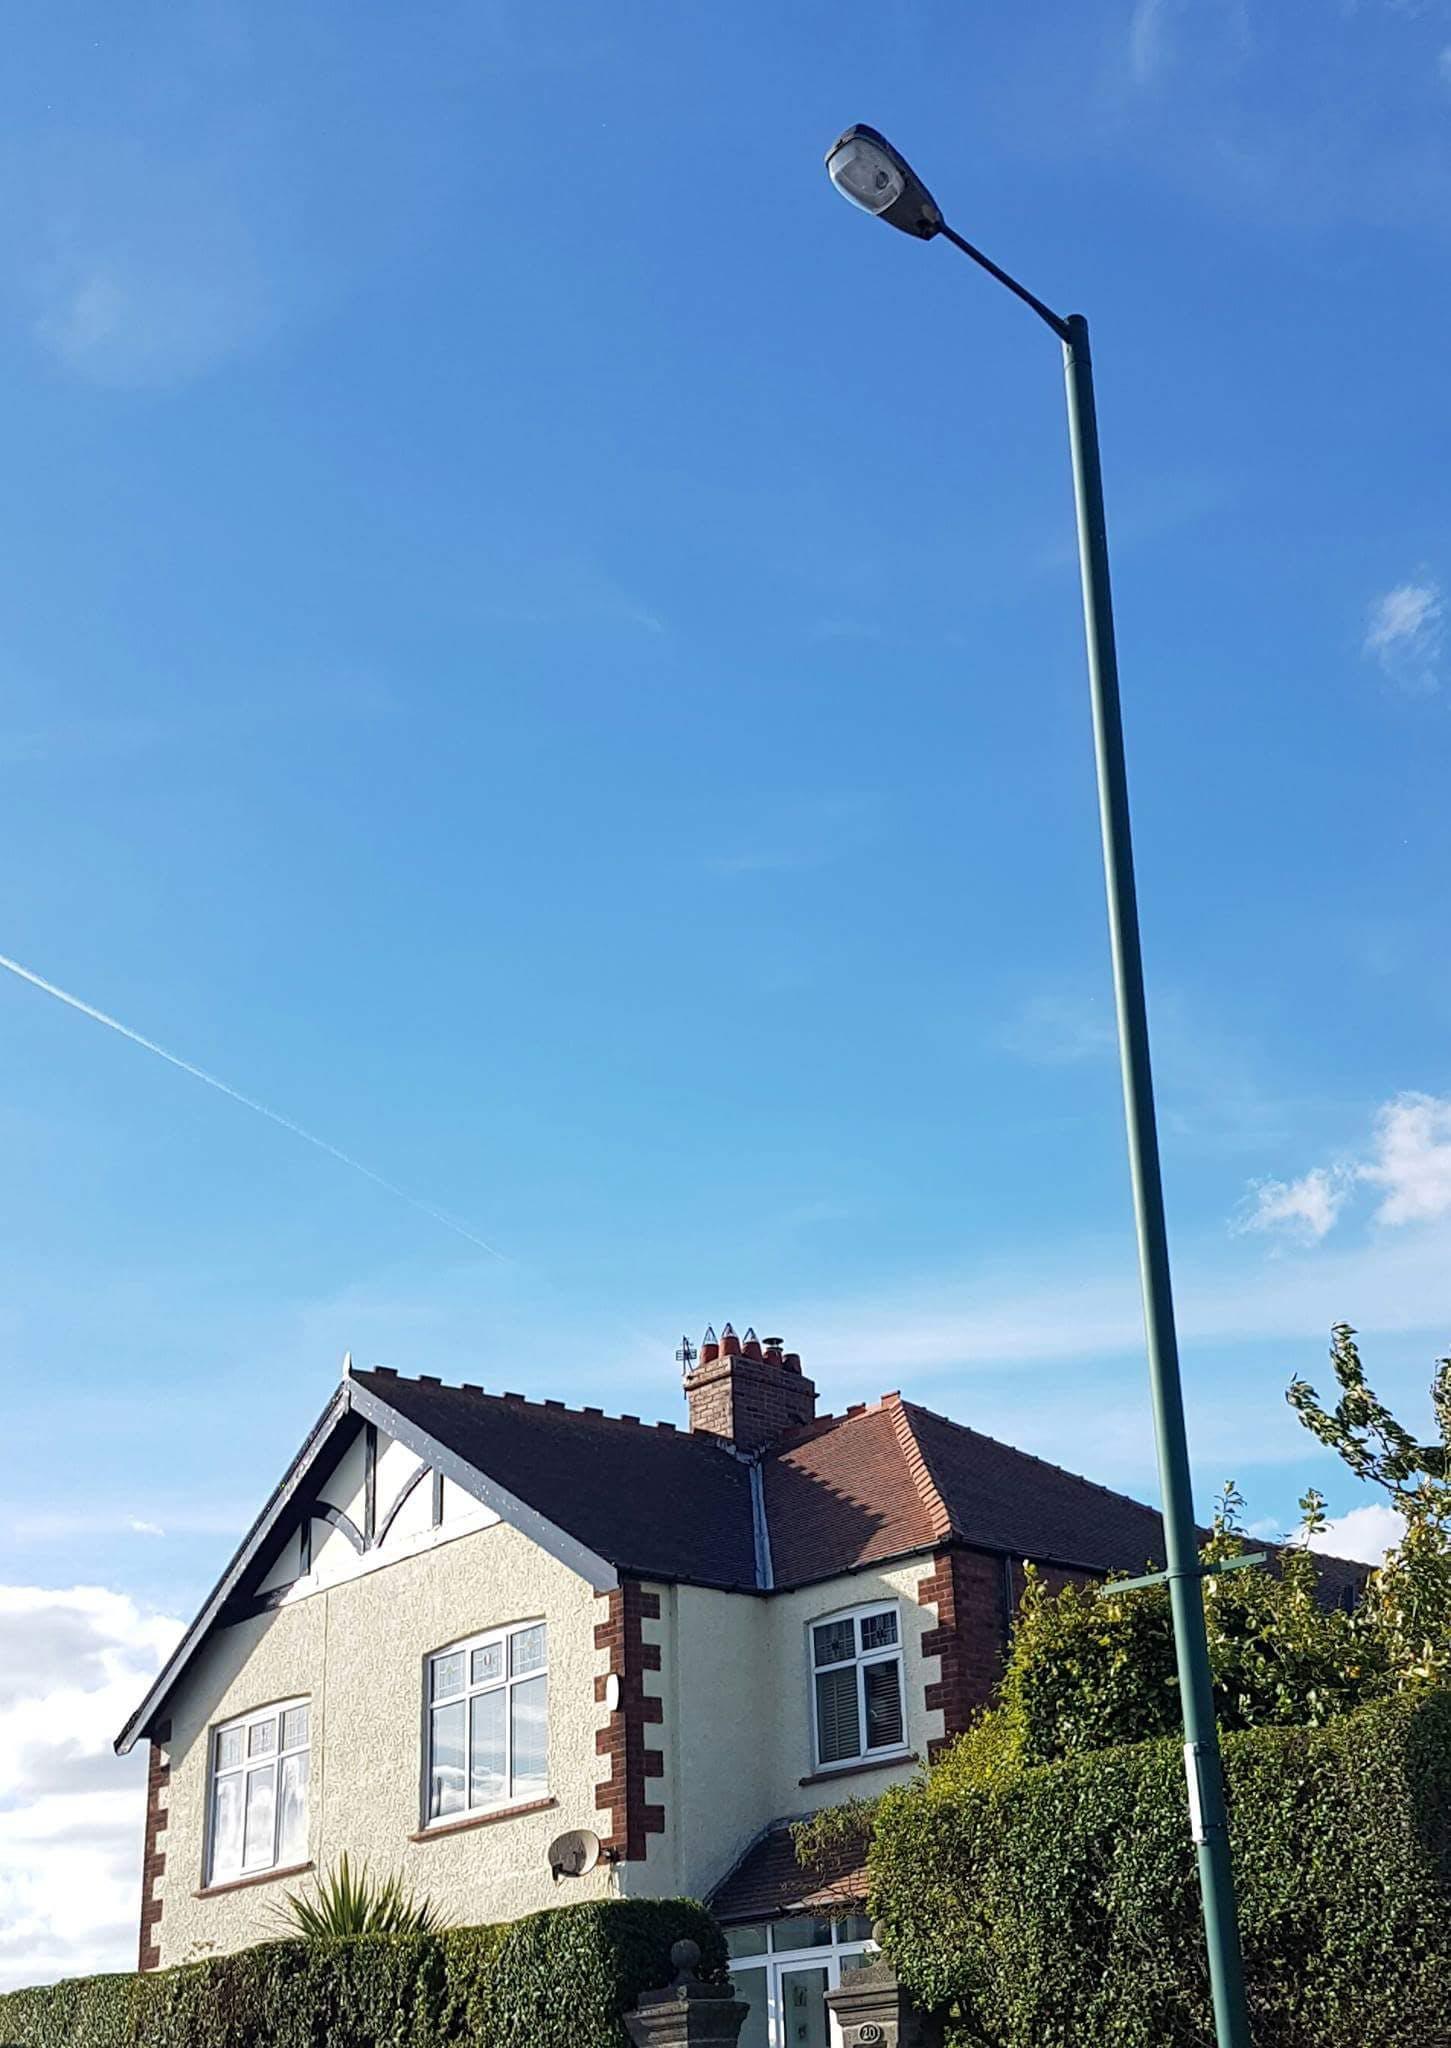 Free stock photo of blue sky, house, lifestyle